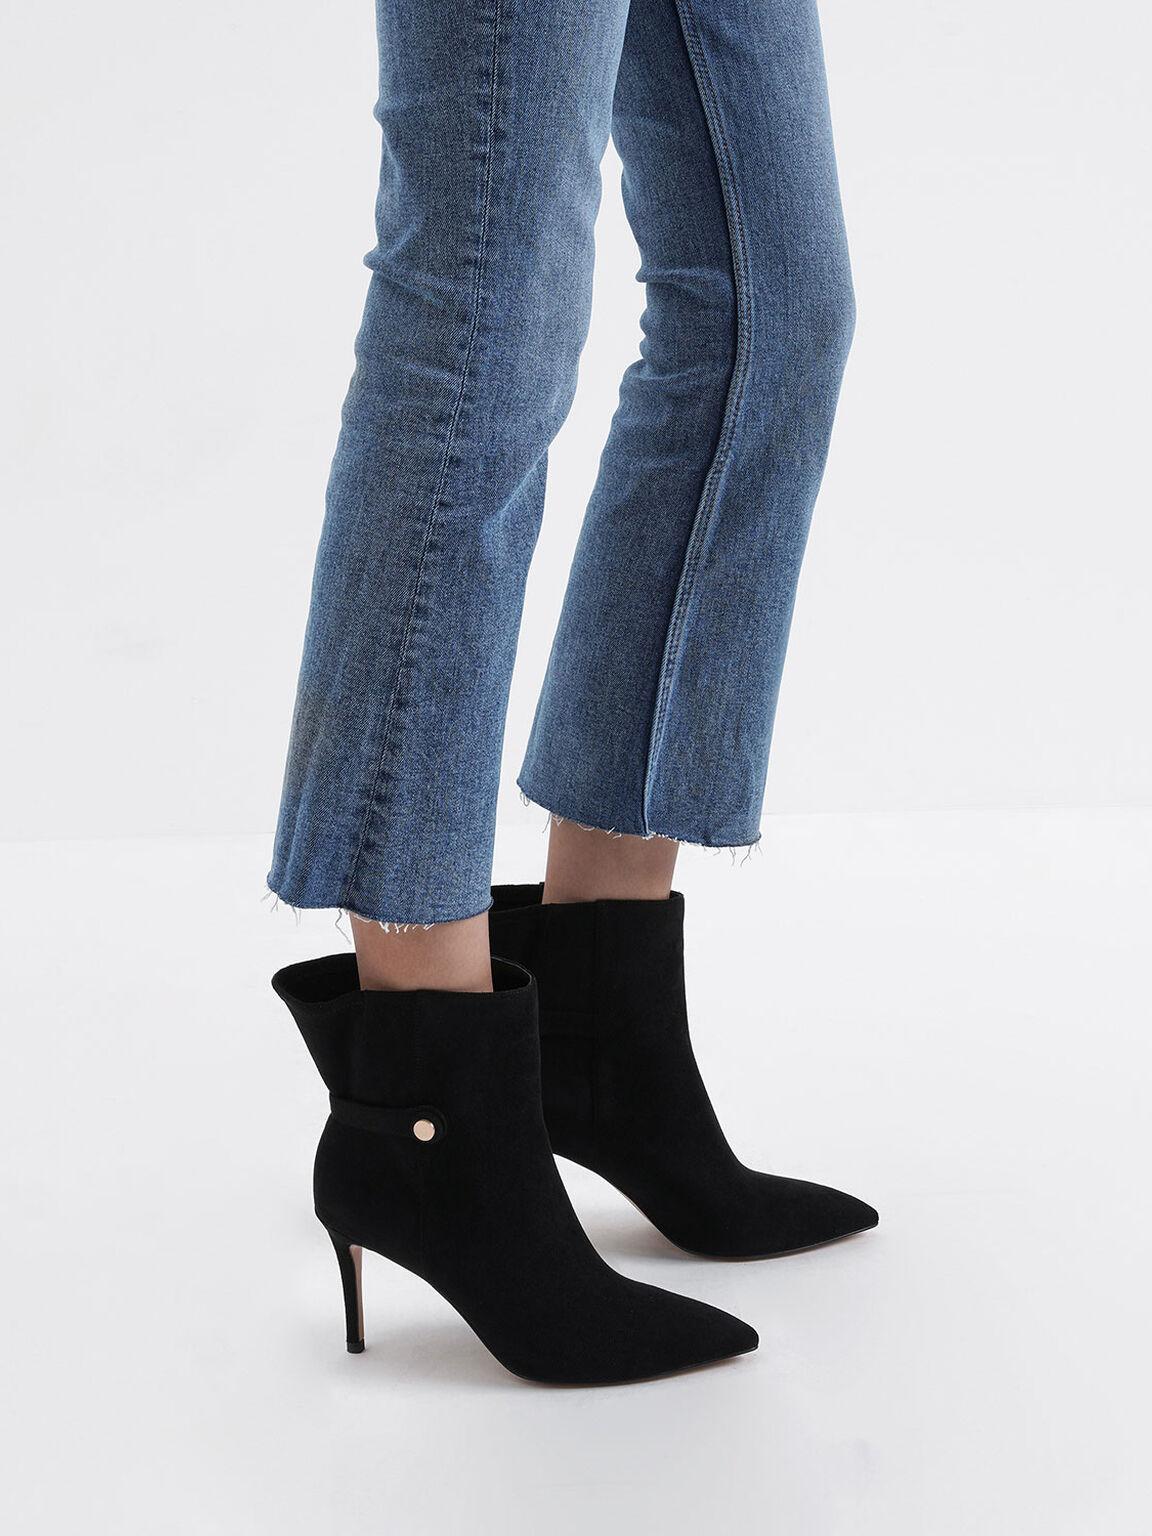 Textured Stiletto Heel Ankle Boots, Black, hi-res